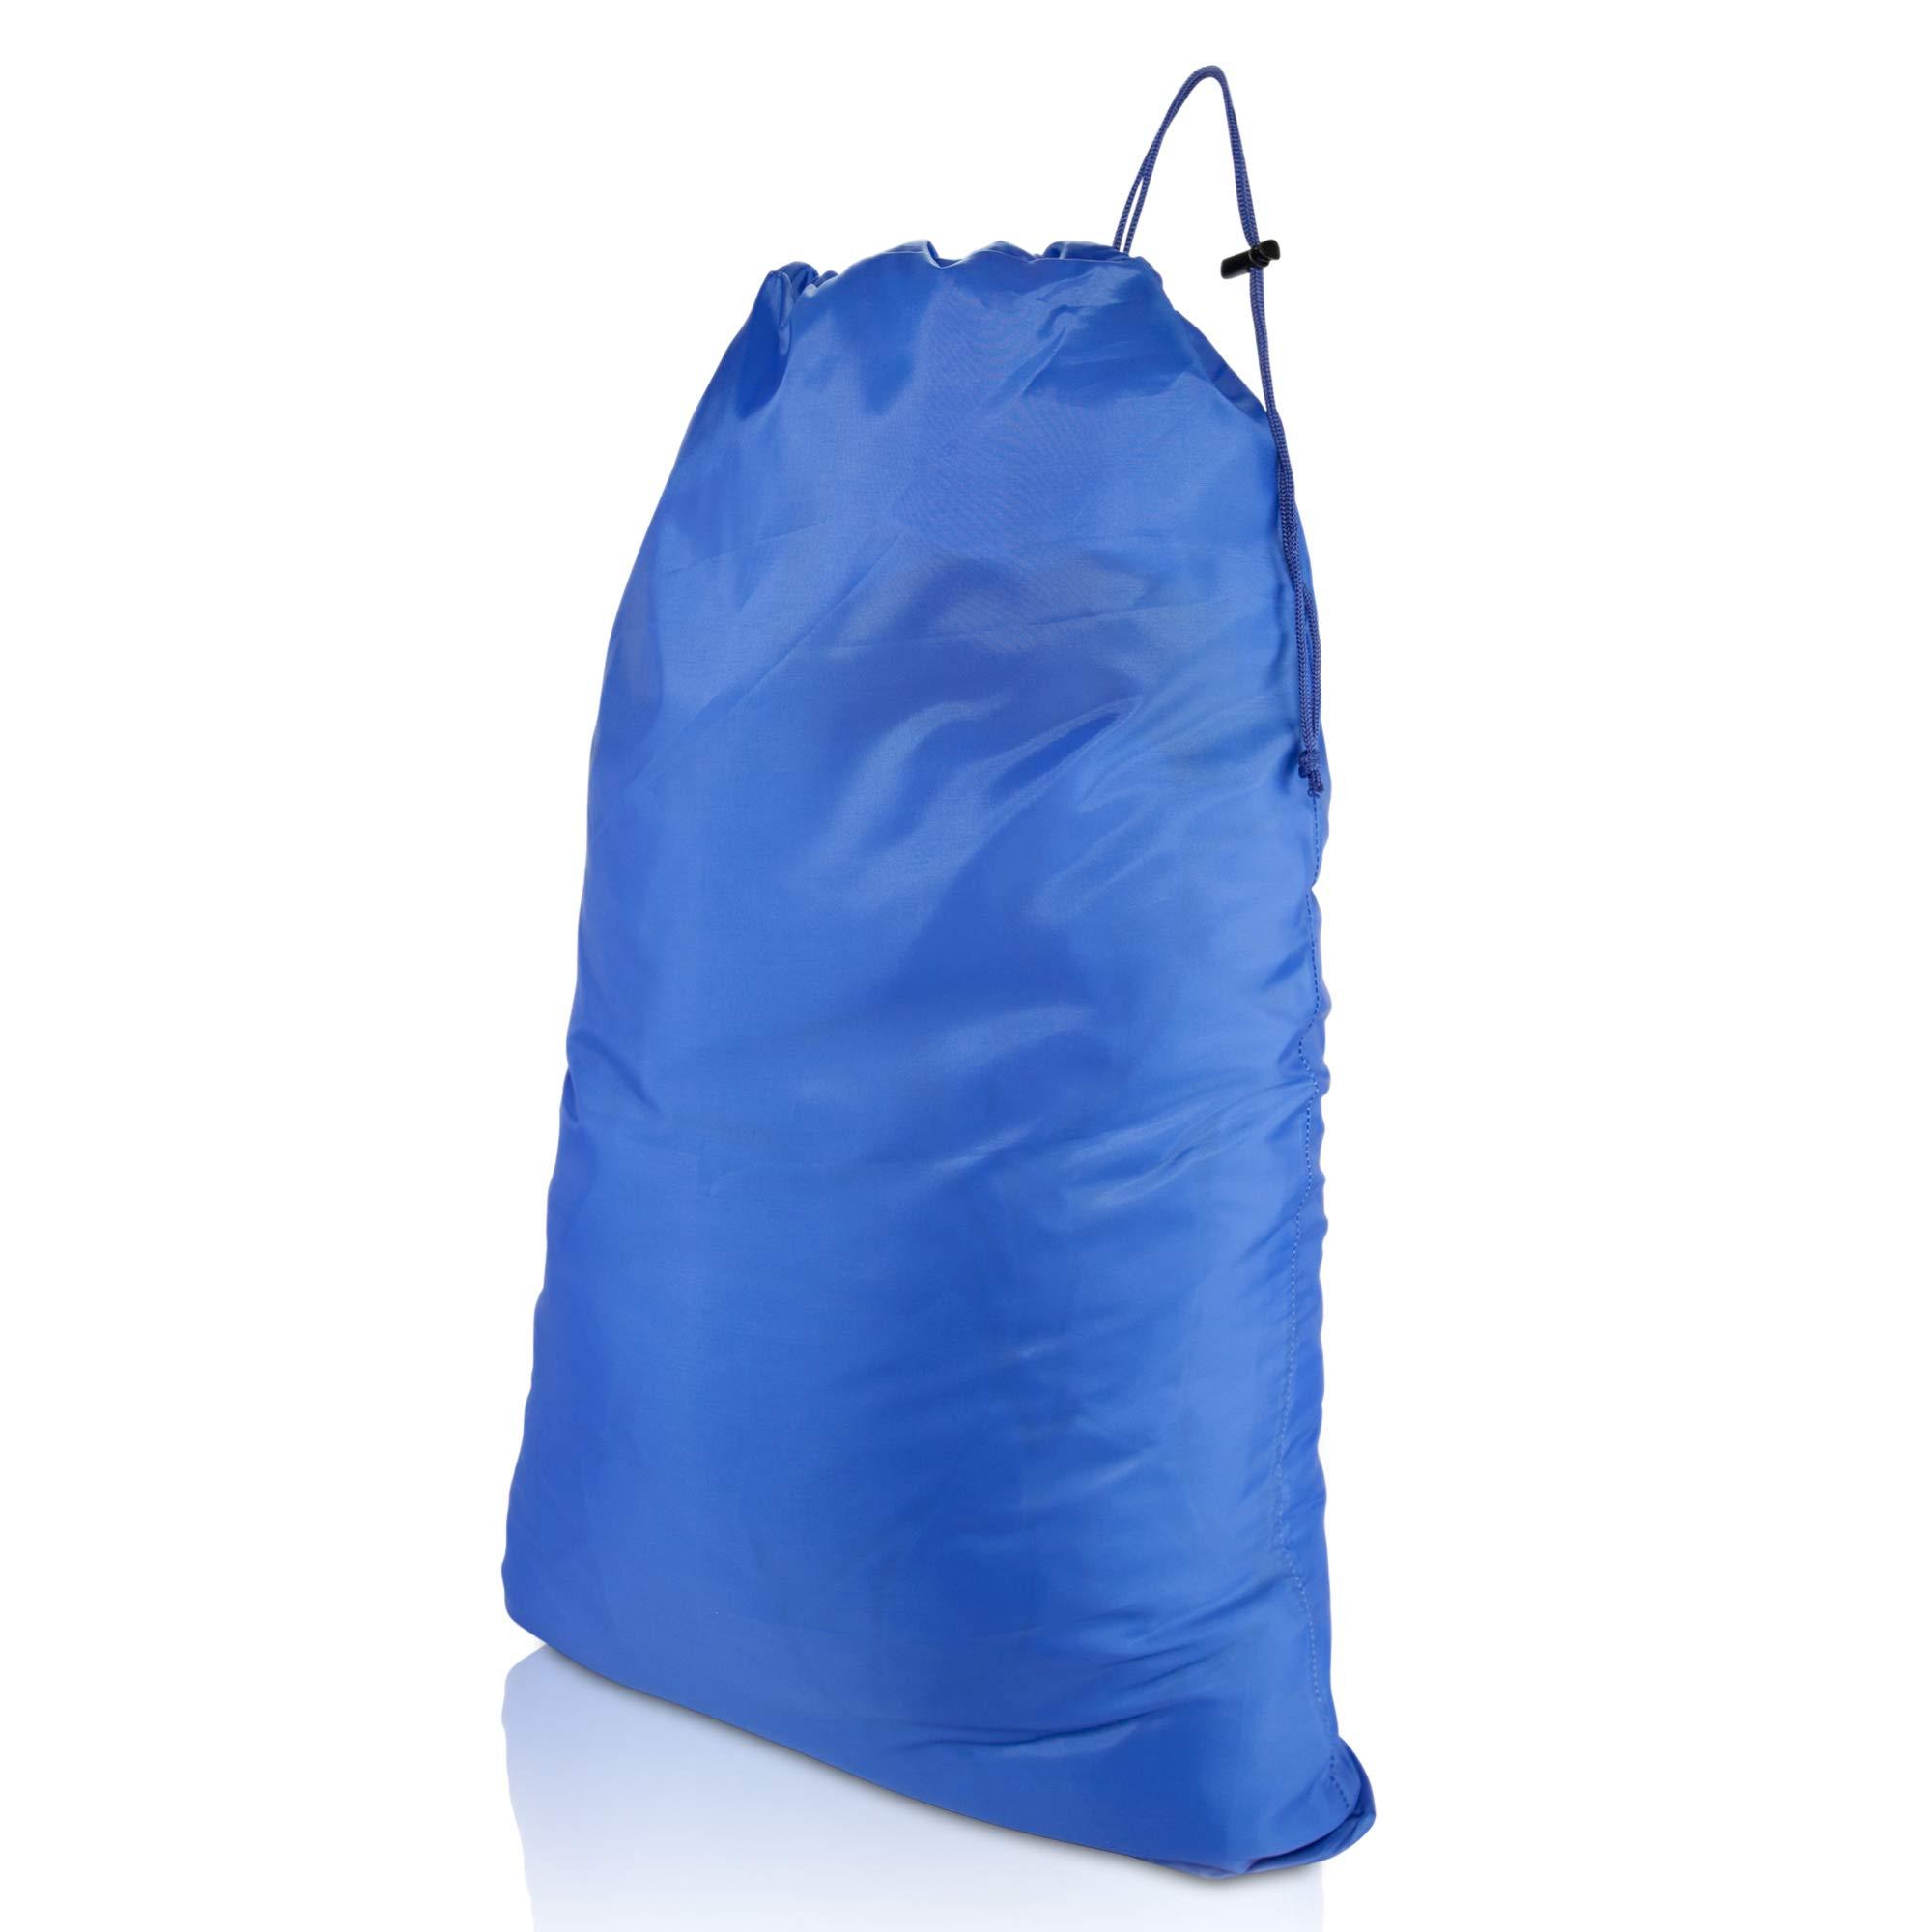 DALIX Large Laundry Bag Drawstring Sack Heavy Duty Tear Resistant in Royal Blue